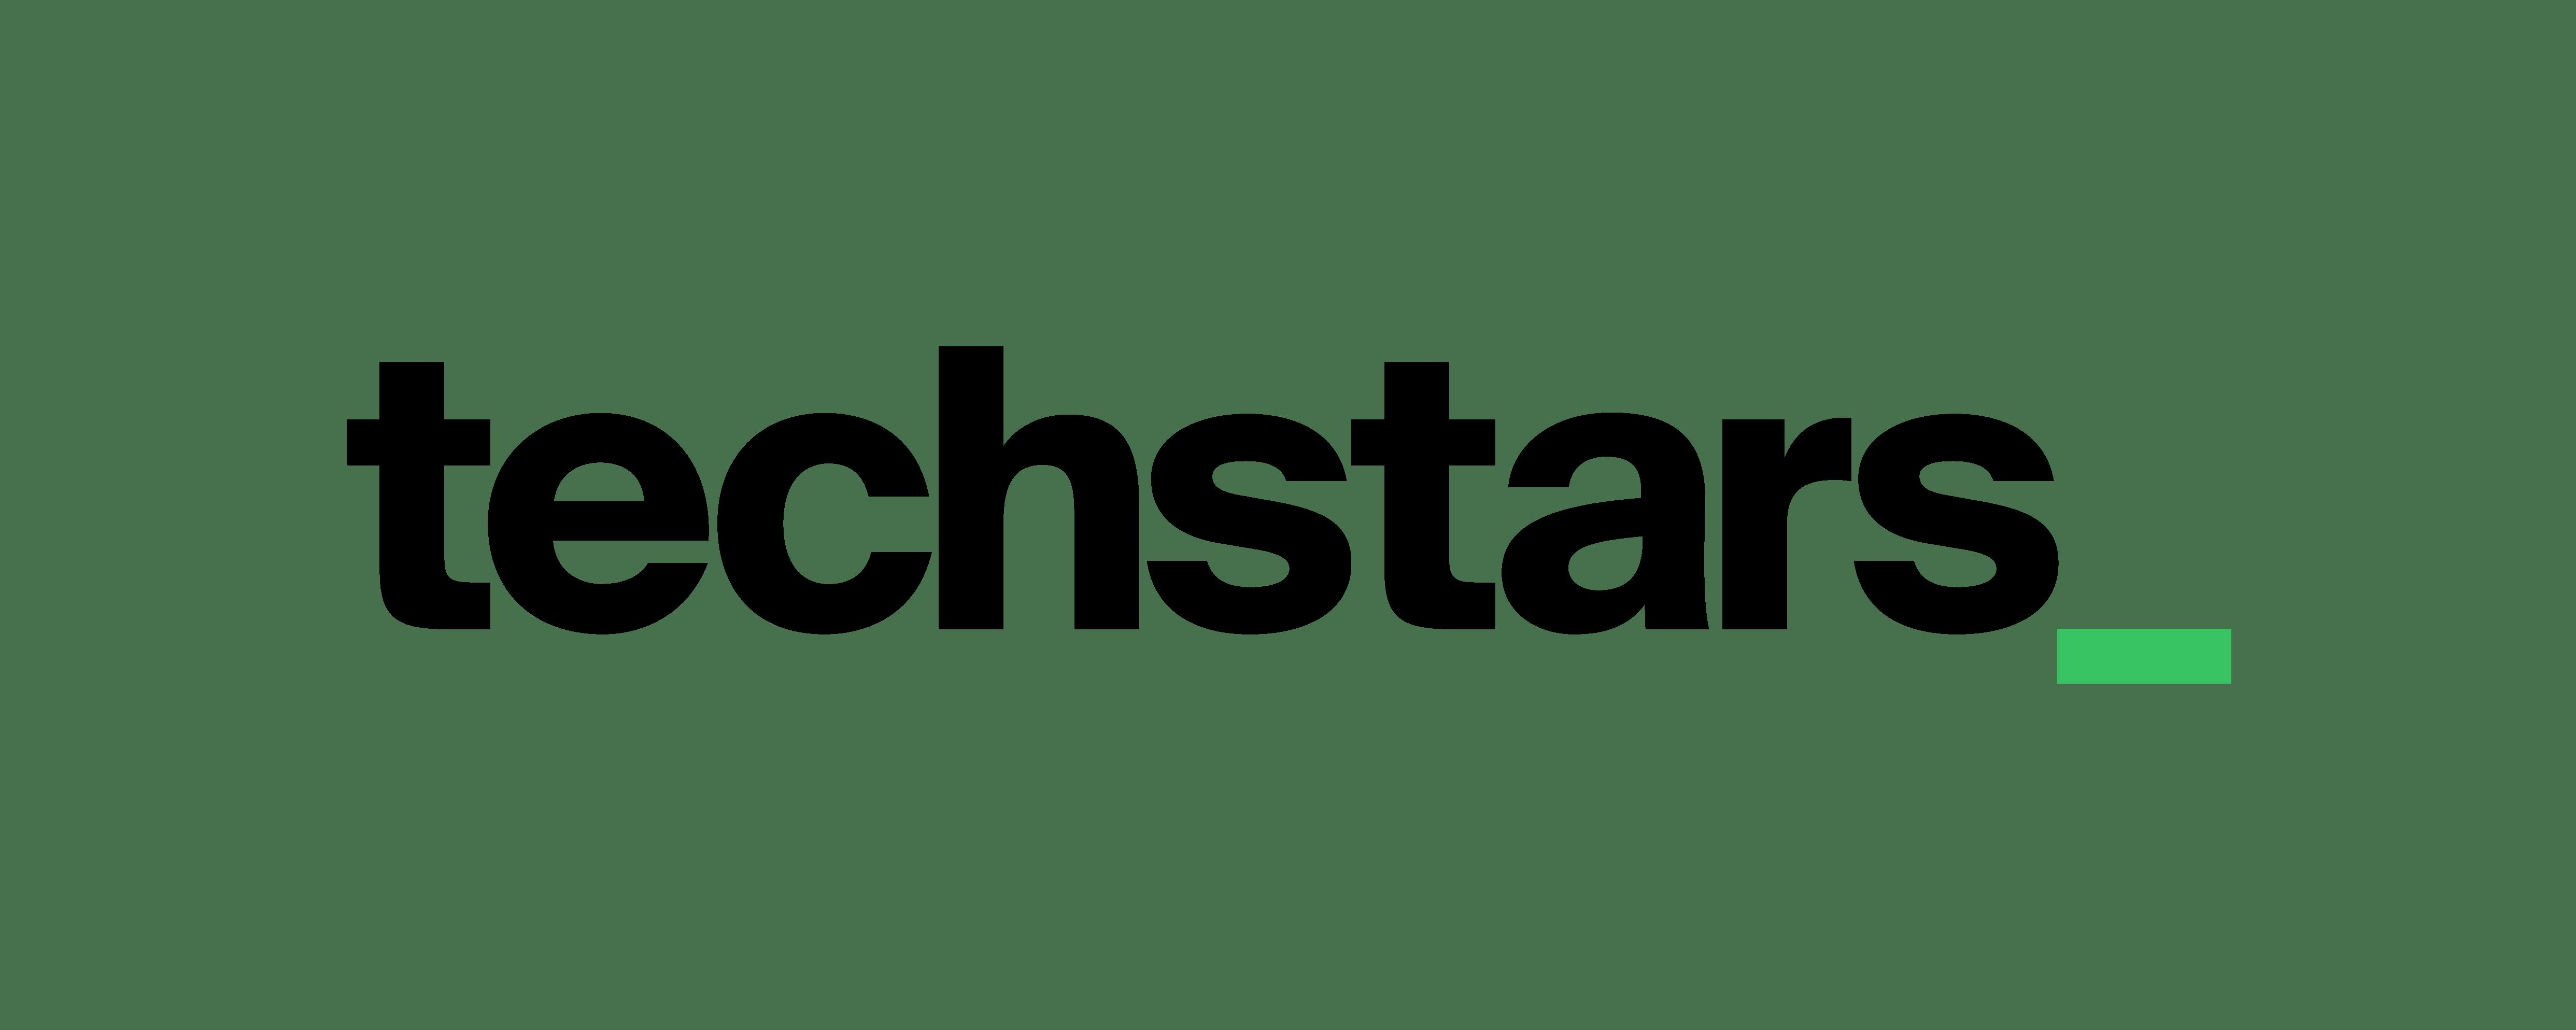 Techstars Accelerator - Assemblr Augmented reality Platform